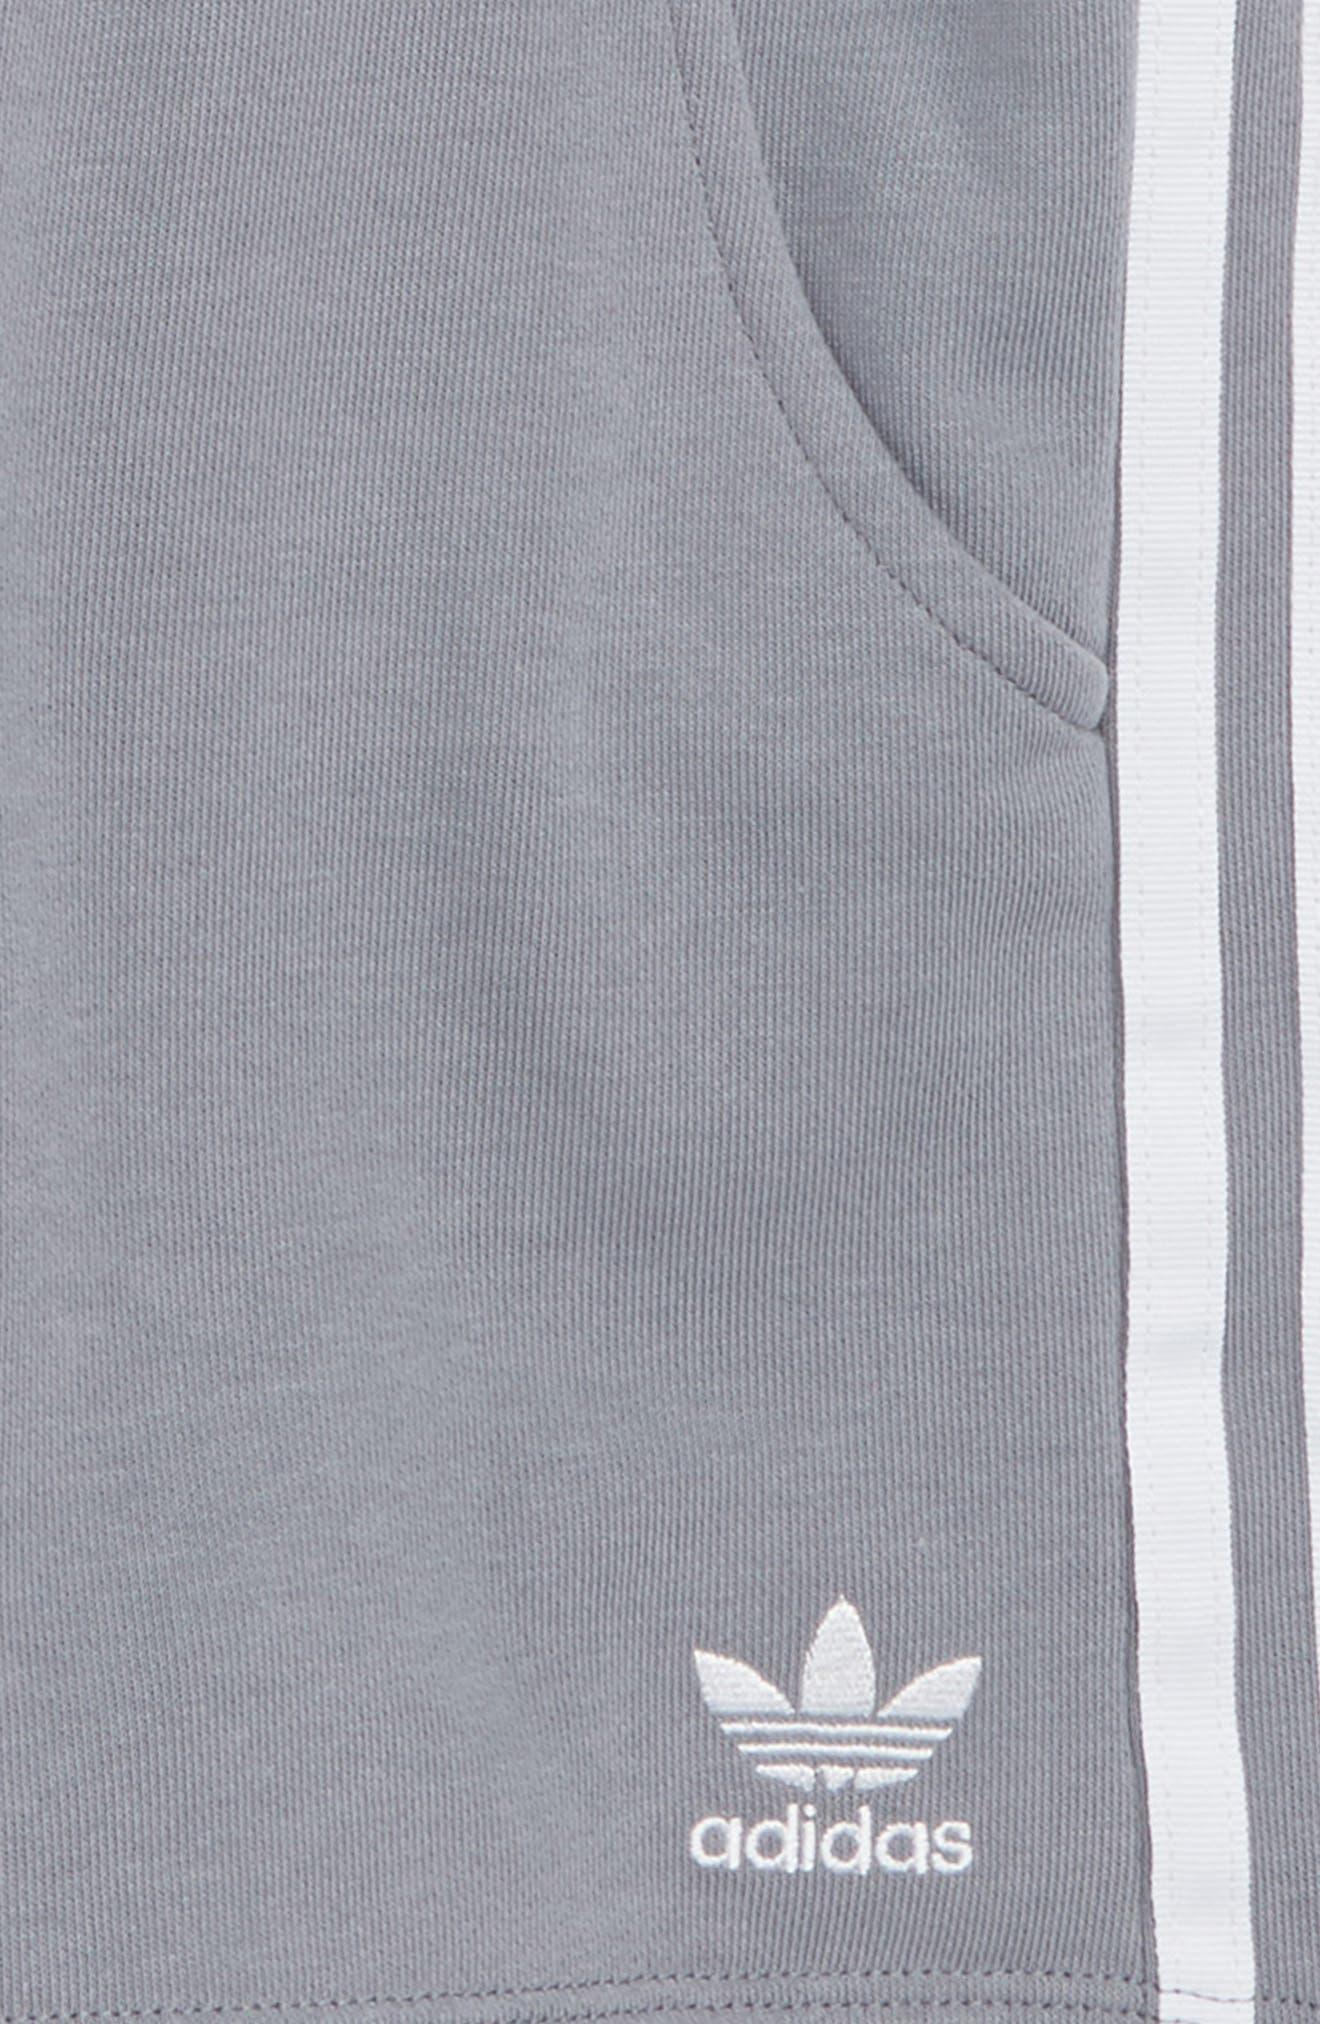 Logo Shorts,                             Alternate thumbnail 2, color,                             020